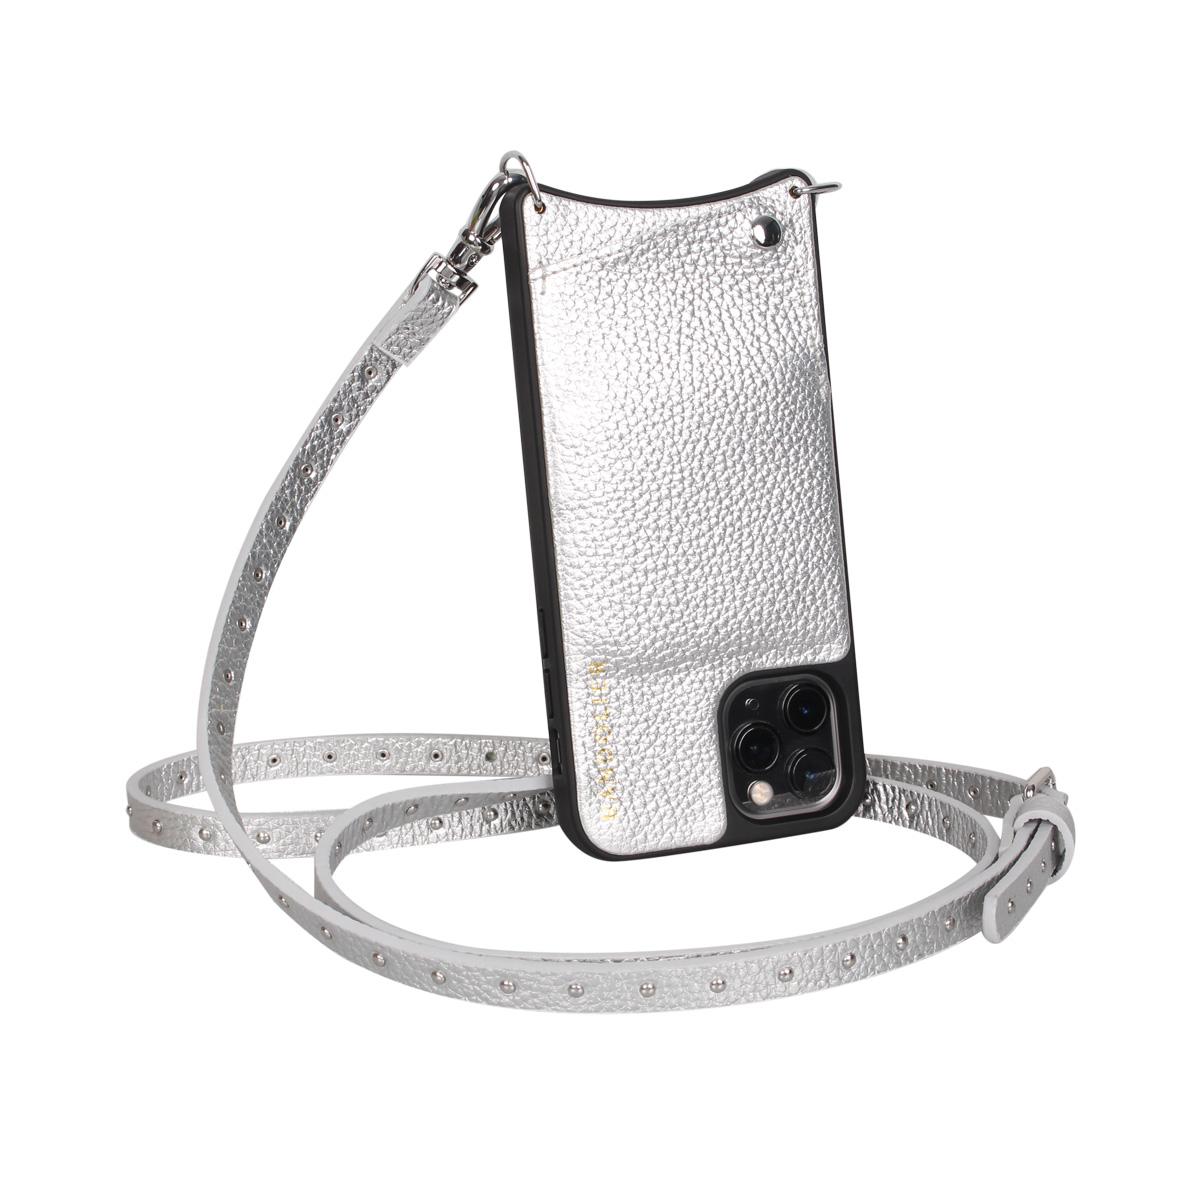 BANDOLIER NICOLE RICH SILVER バンドリヤー iPhone11 Pro MAX ケース スマホ 携帯 ショルダー アイフォン メンズ レディース レザー シルバー 10NIC